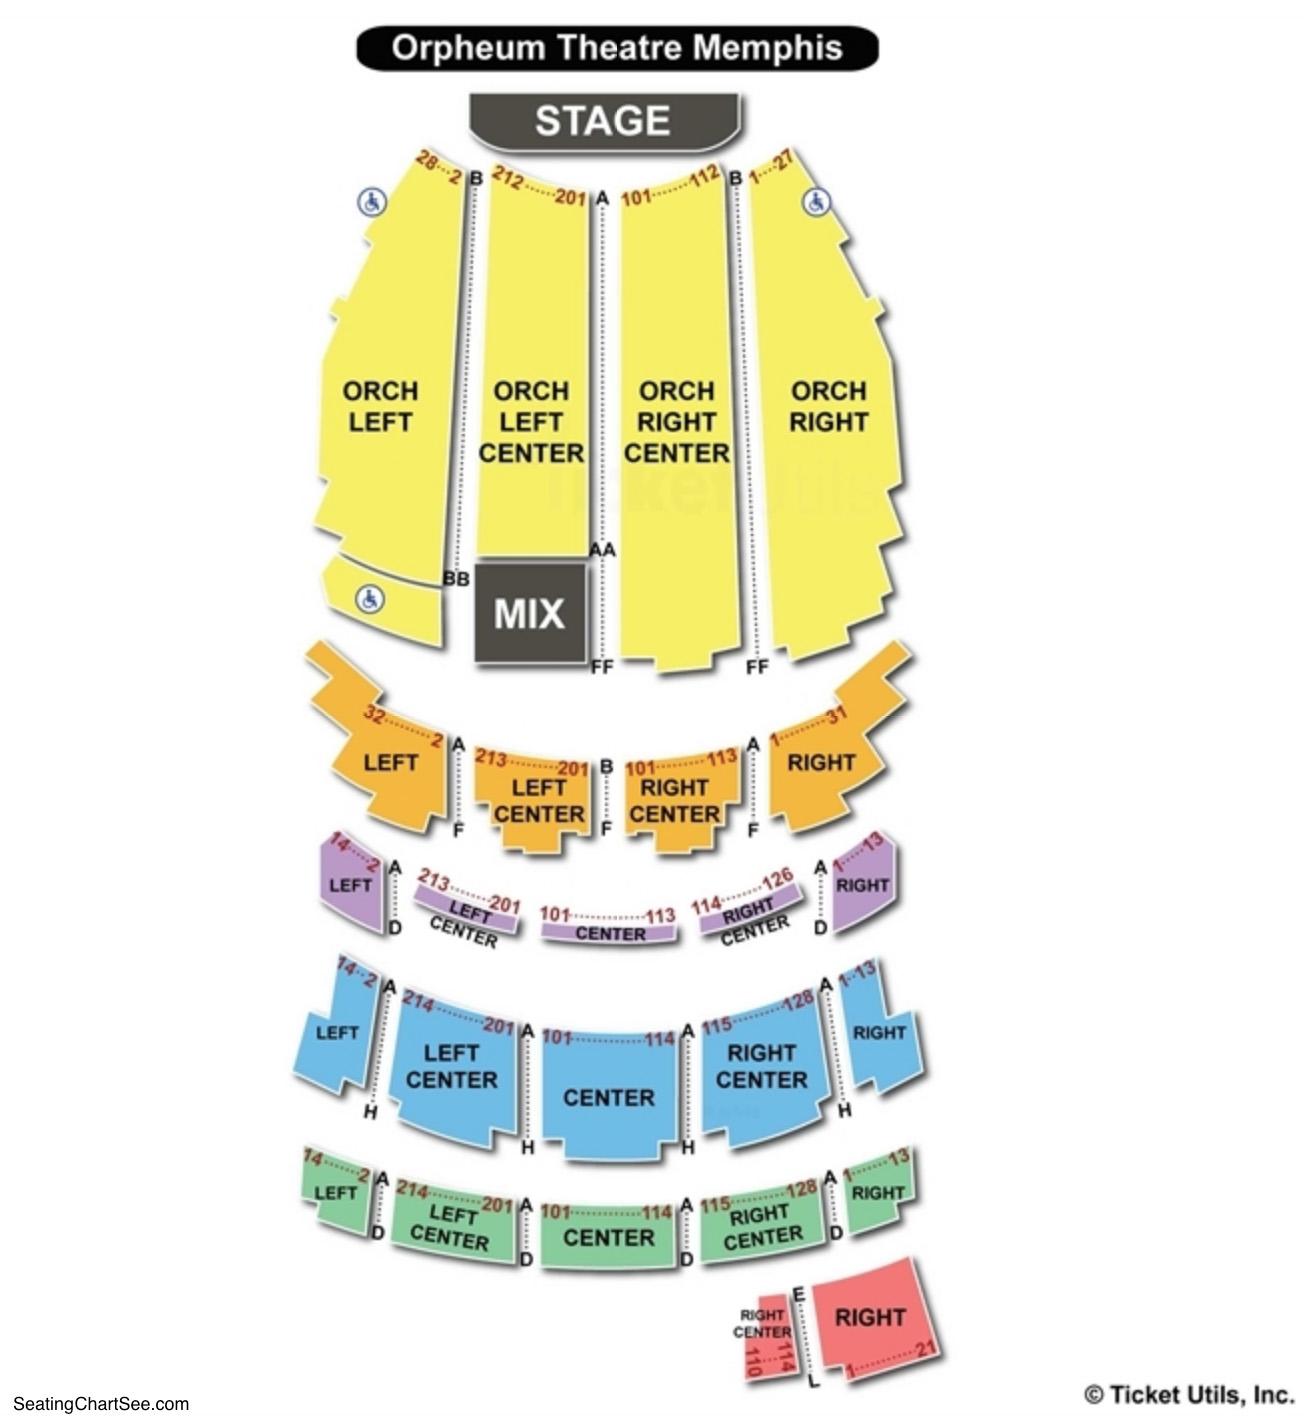 Orpheum Theatre Memphis Seating Chart